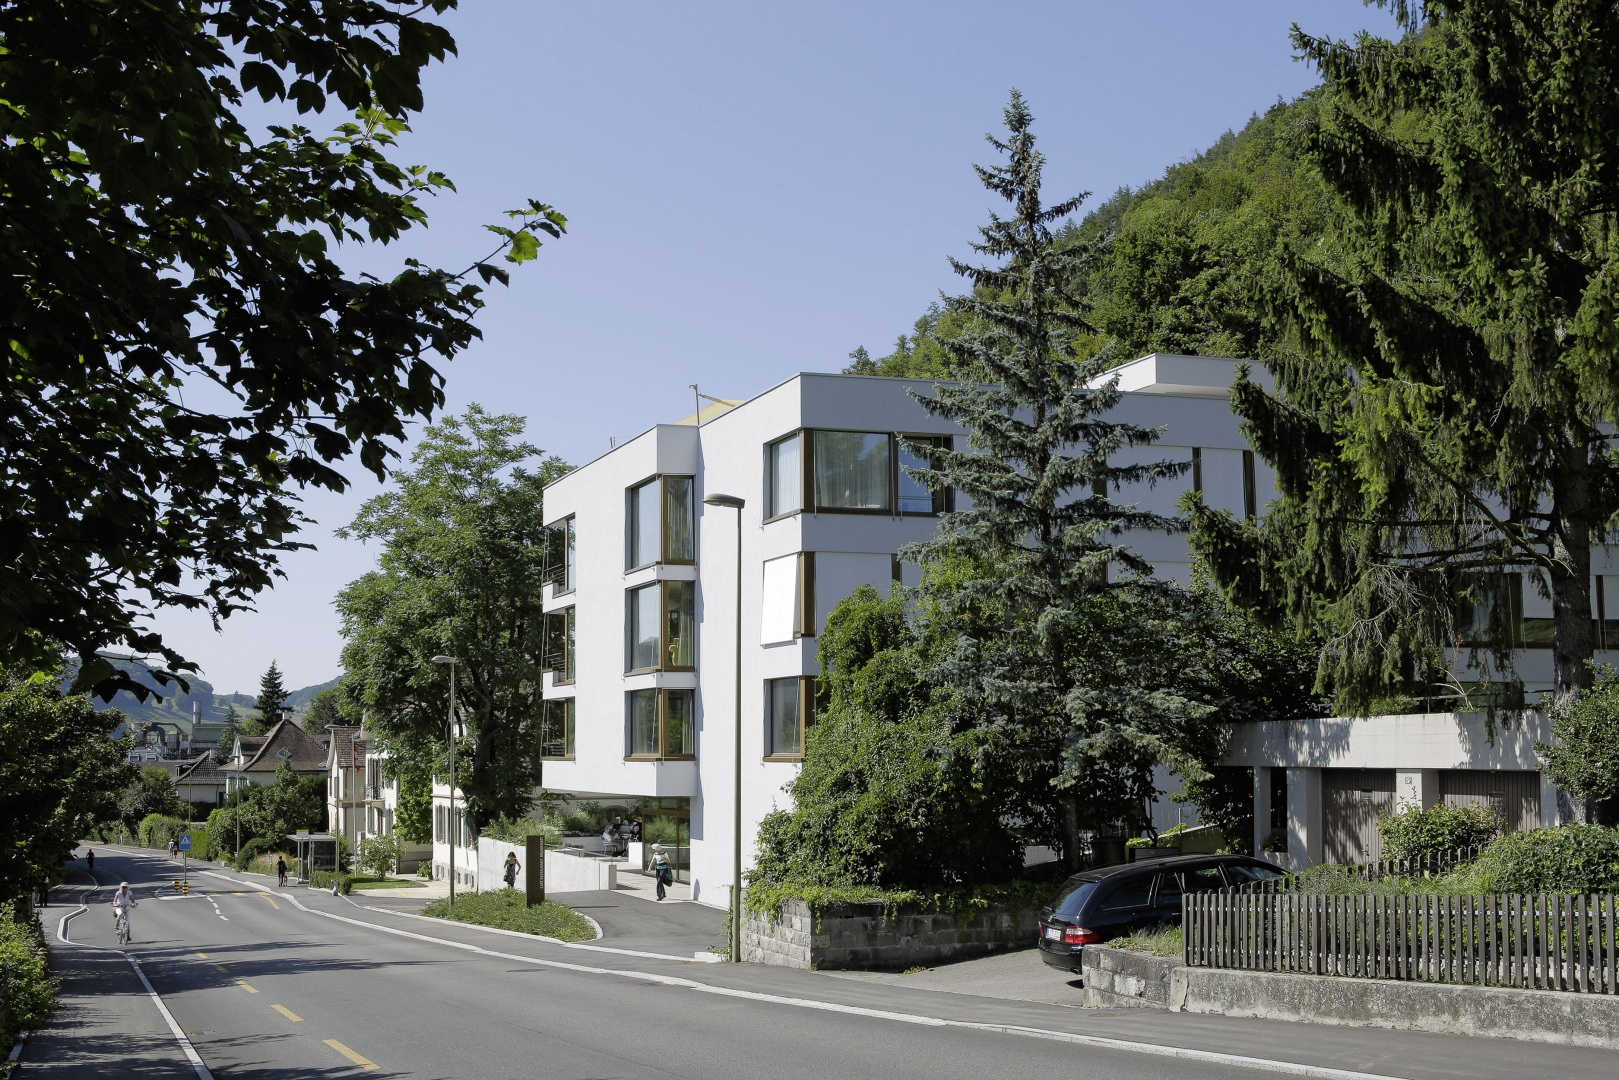 Brunnmatt_Strassenansicht-Ost © Tom Bisig, Basel